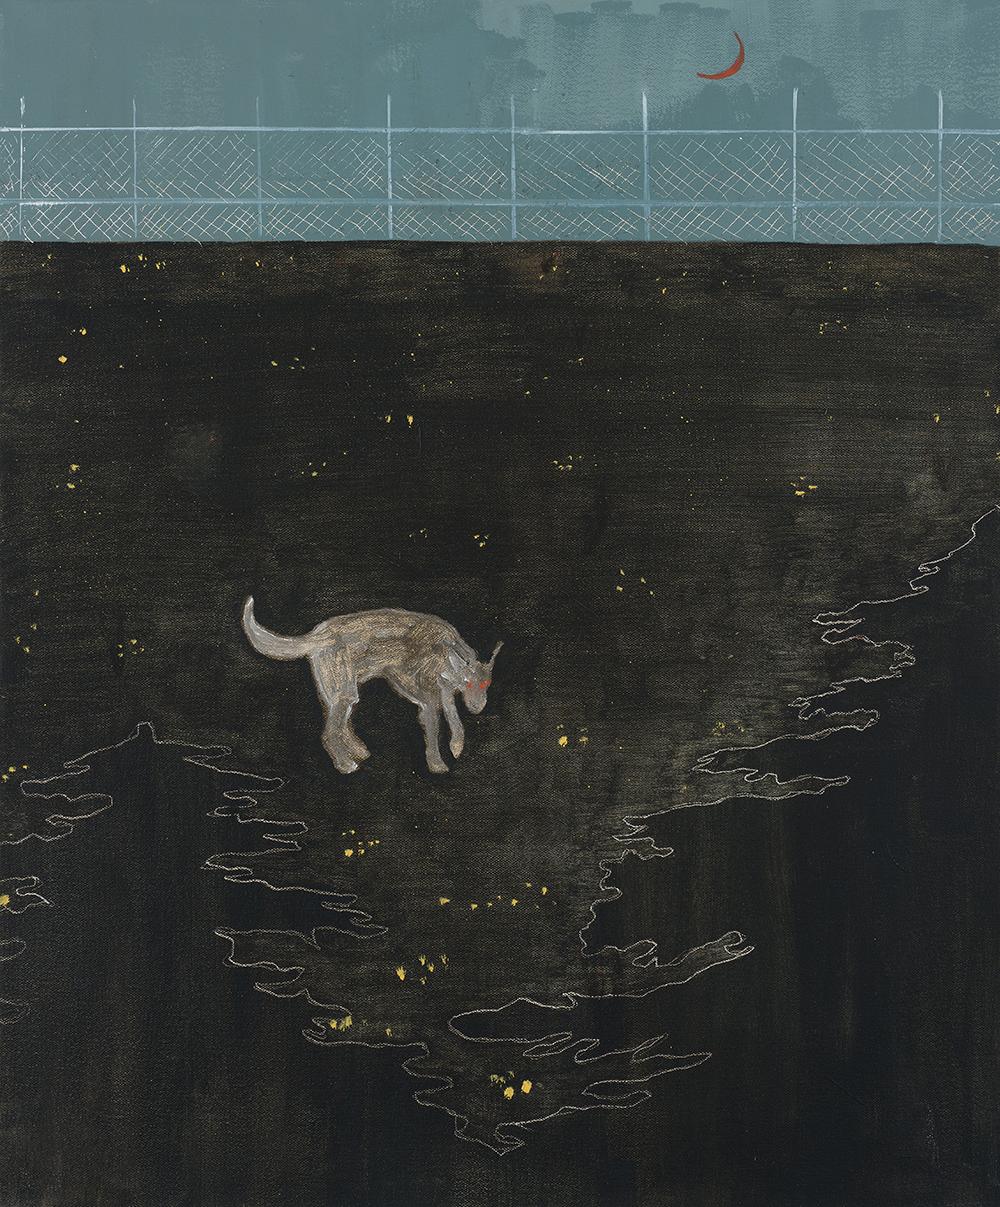 Francisco Rodriguez.<em> Dog at Night</em>, 2019. Oil on canvas, 23 5/8 x 19 5/8 inches (60 x 50 cm)